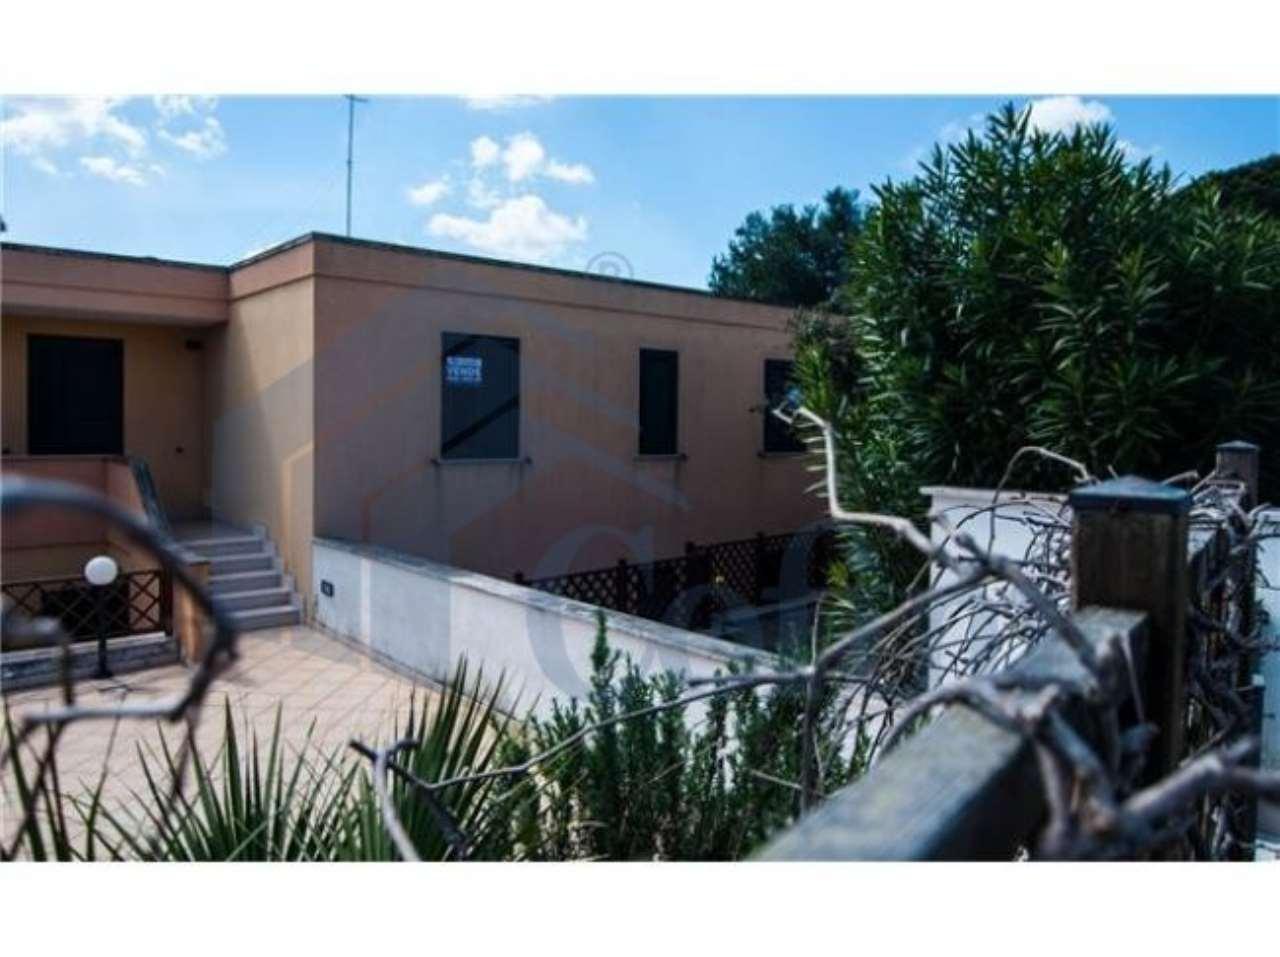 Appartamento in Vendita a Santa Cesarea Terme